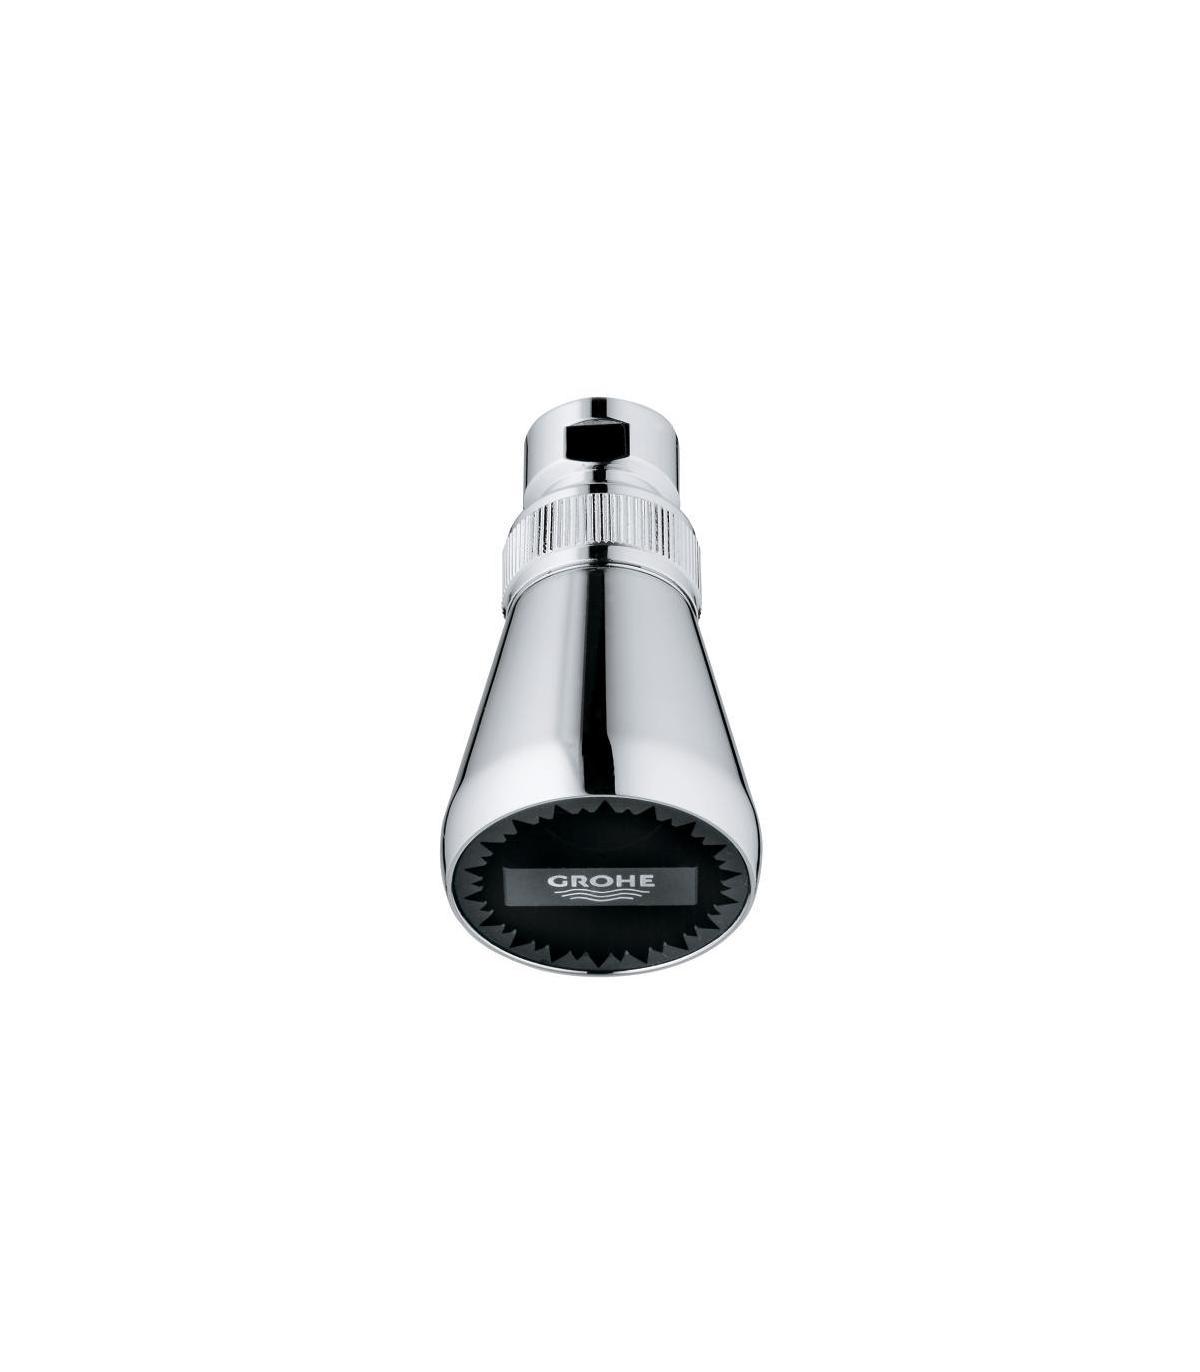 Lavabi In Ceramica Dolomite.Semicolonna Per Completamento Lavabo Ceramica Dolomite Serie Clodia Art J051700